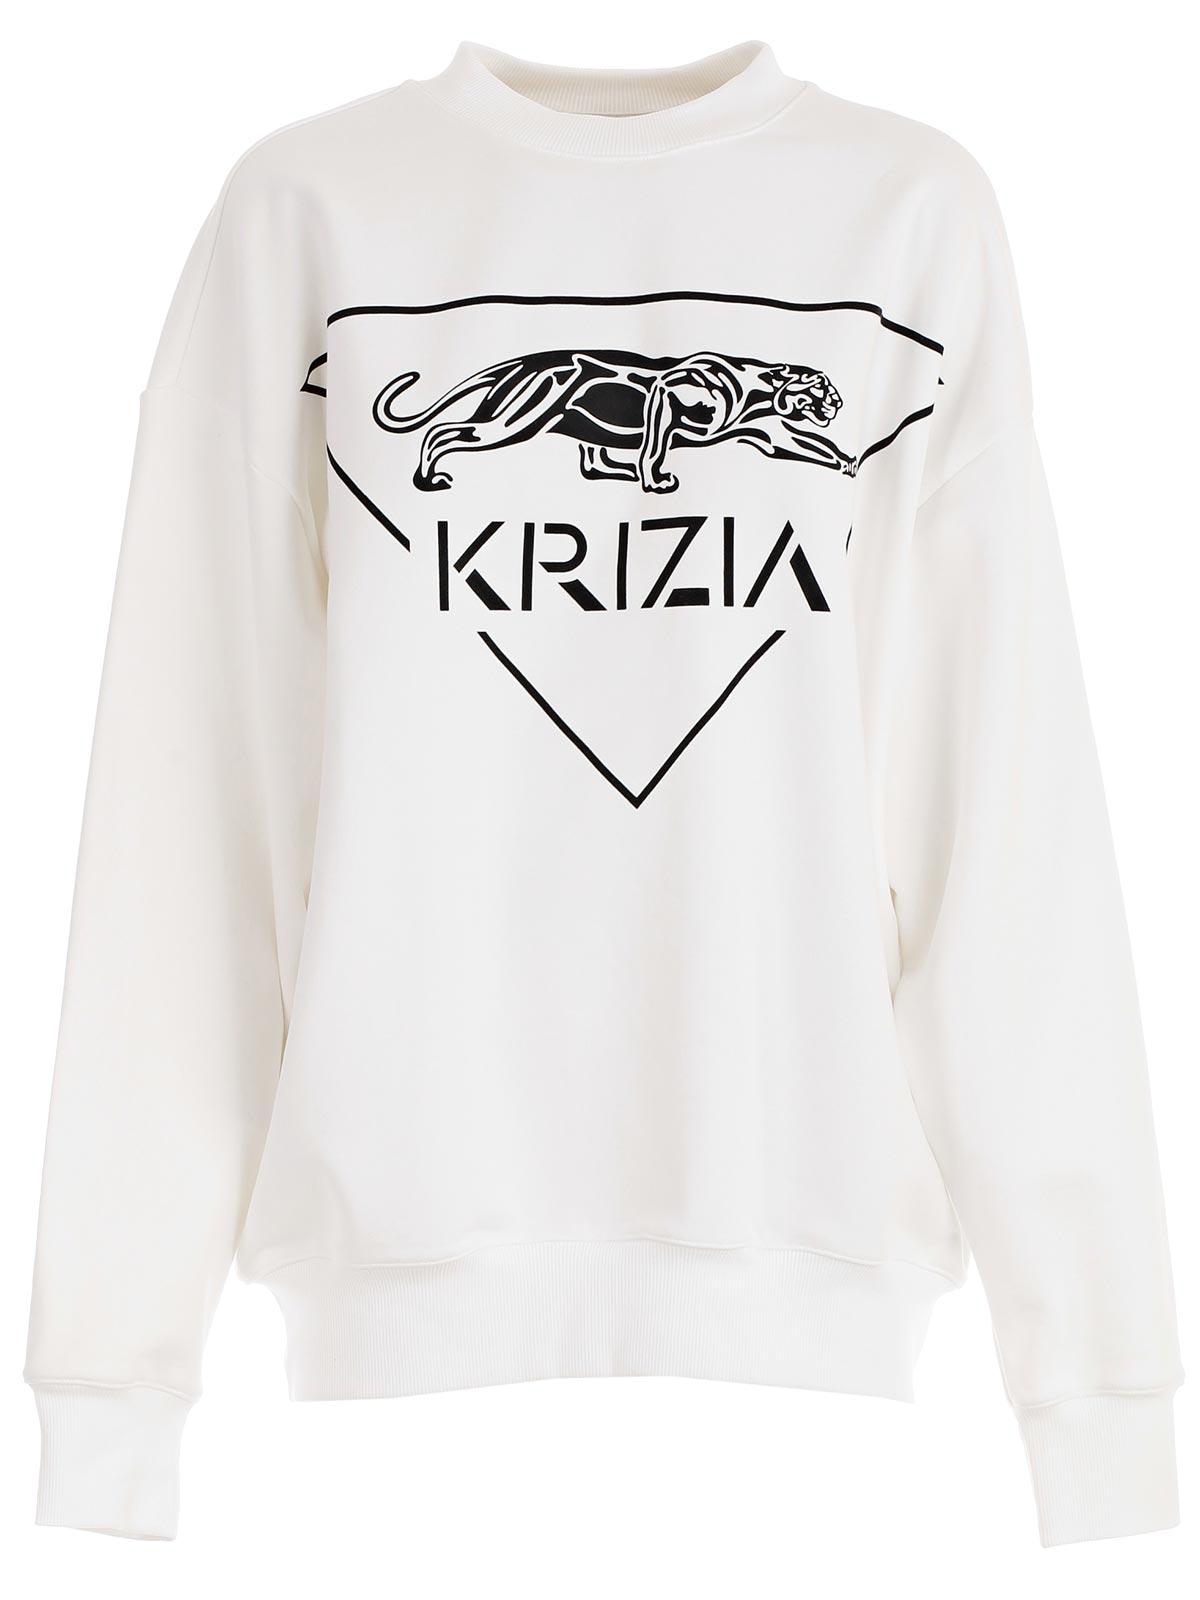 Picture of Krizia Sweatshirt